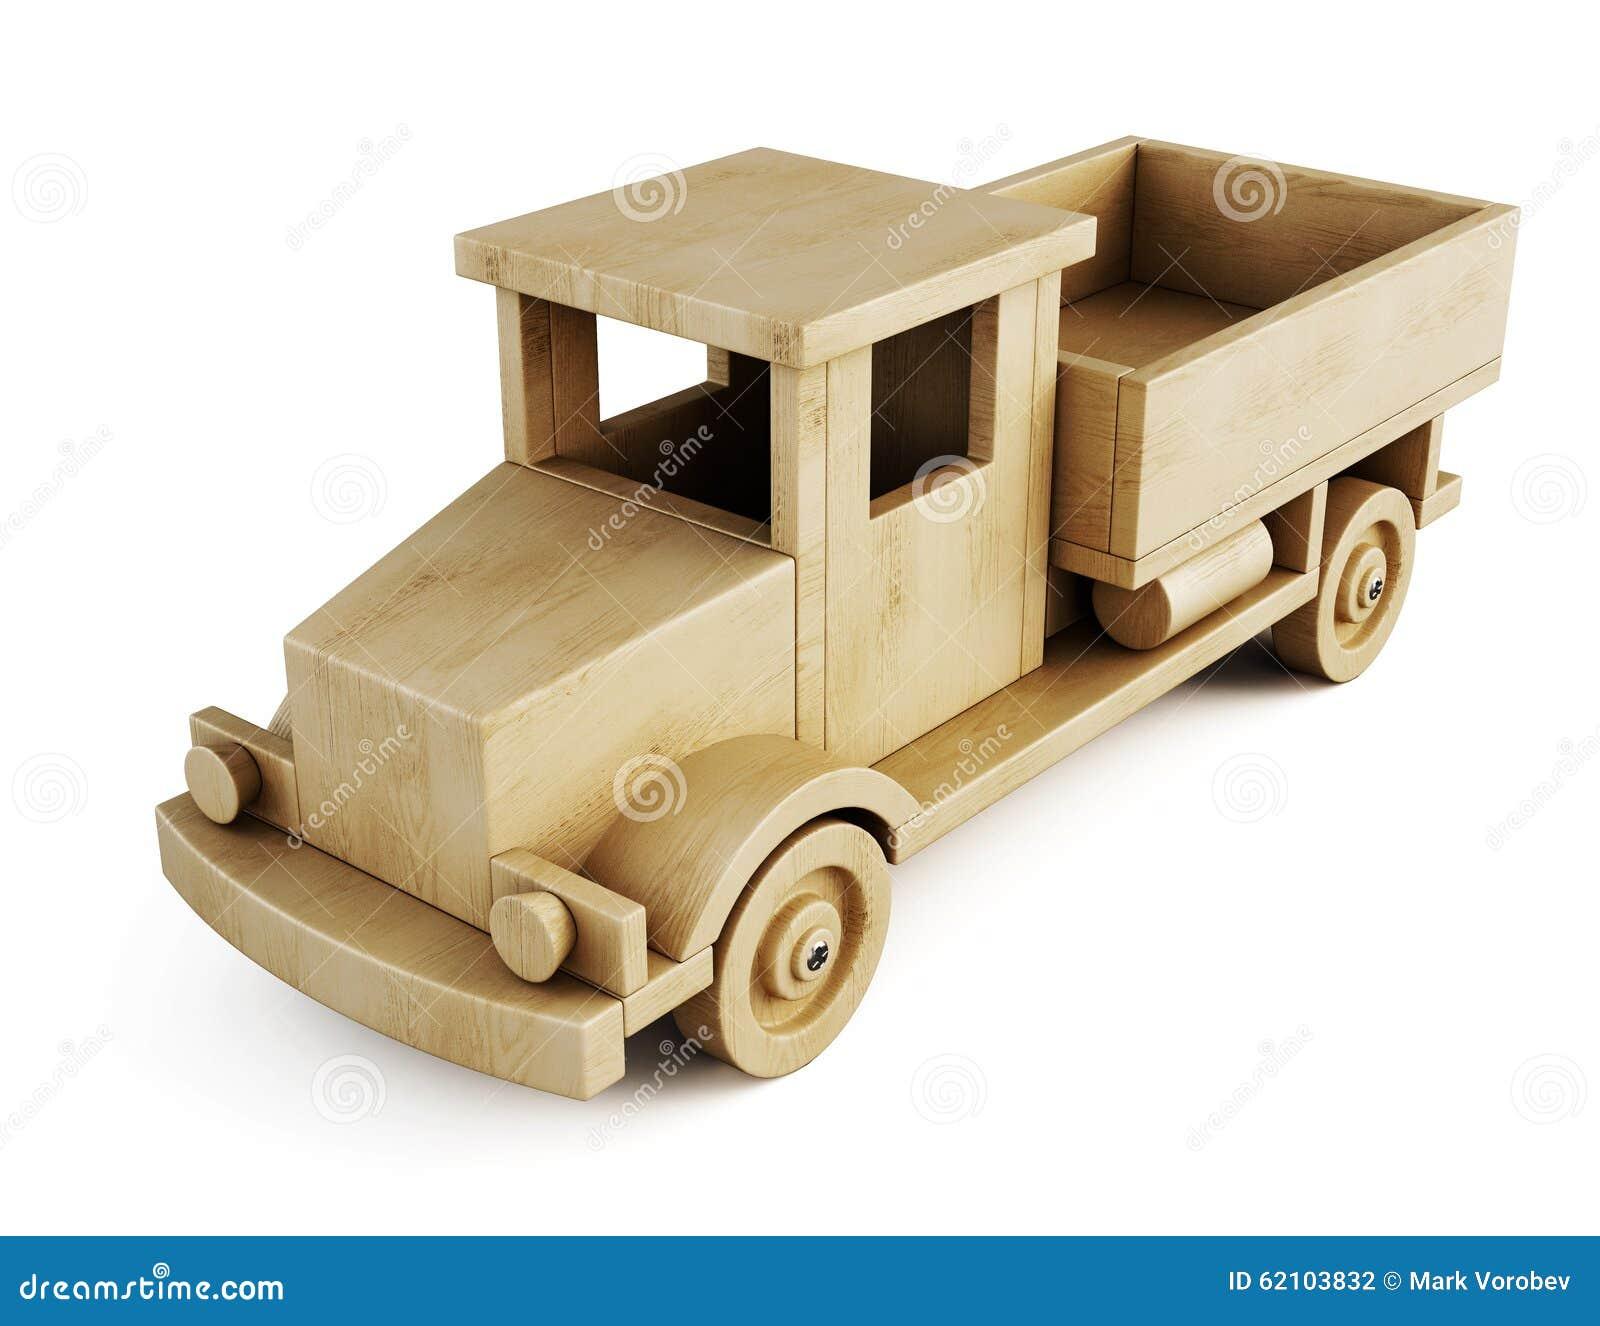 Cami n de madera del juguete aislado en el fondo blanco 3d - Jugueteros de madera ...